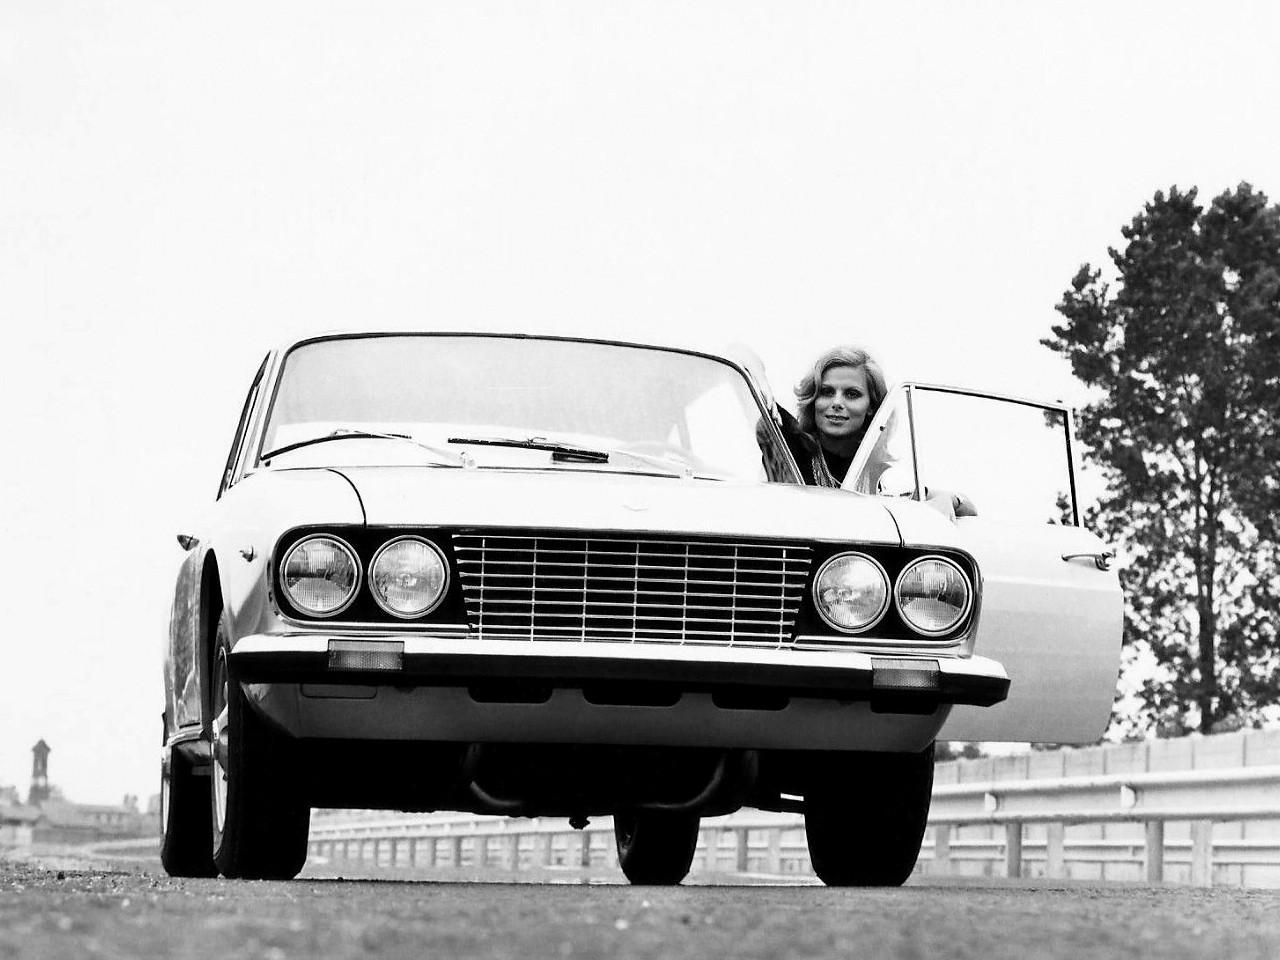 https://s1.cdn.autoevolution.com/images/gallery/LANCIA-2000-Coupe-3372_9.jpg